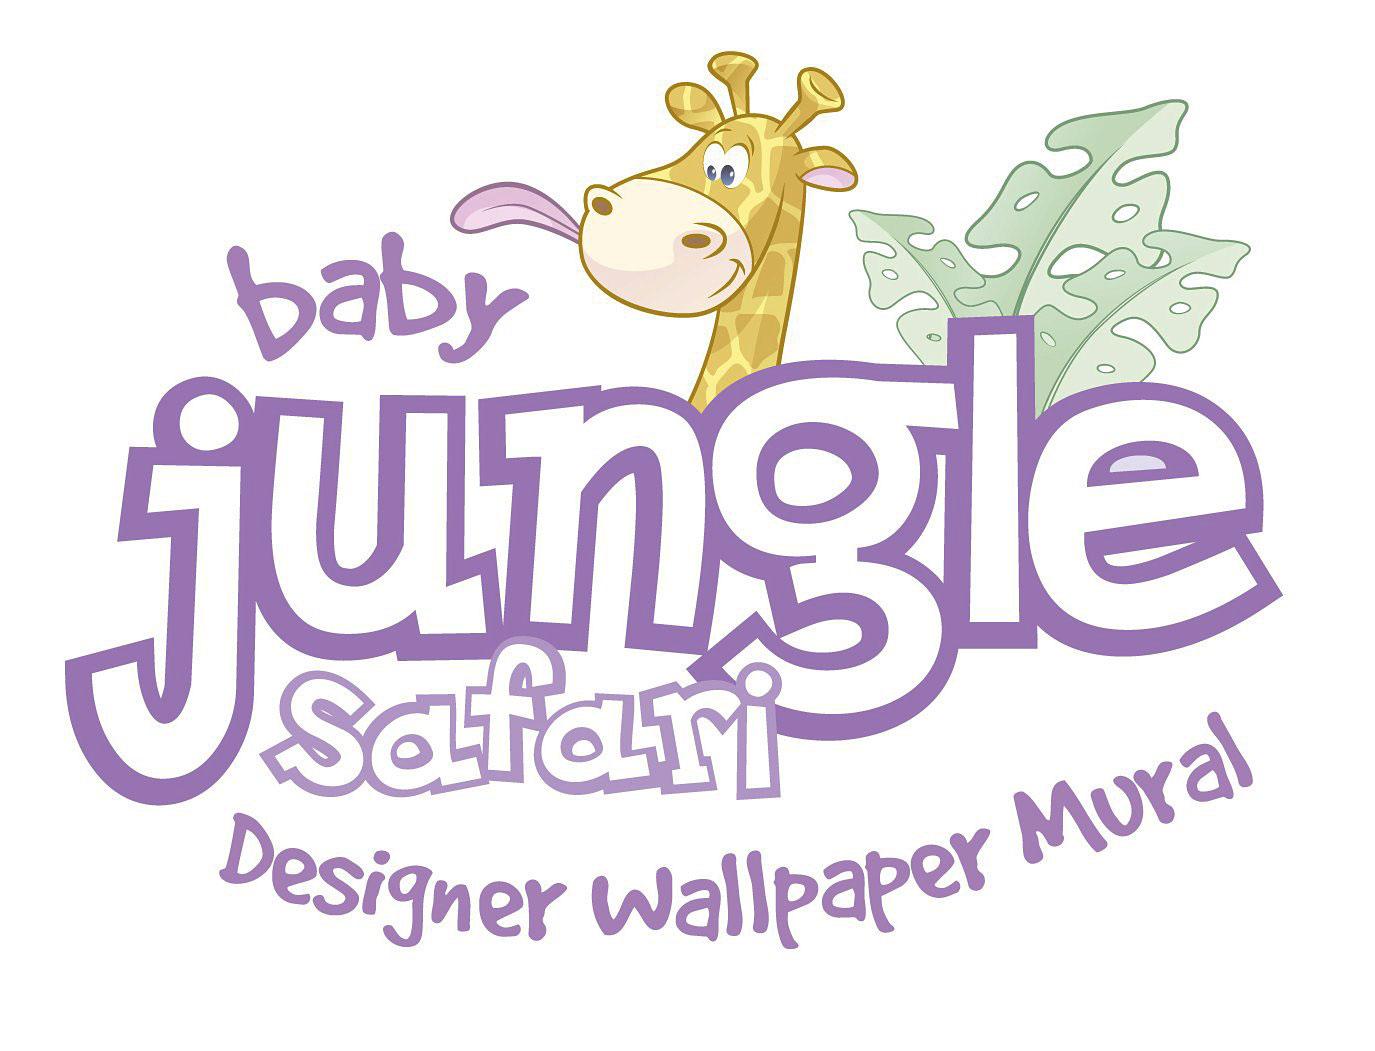 Wandsticker Kinderzimmer Baby Dschungel Tiere Safari Giraffe Affe ...